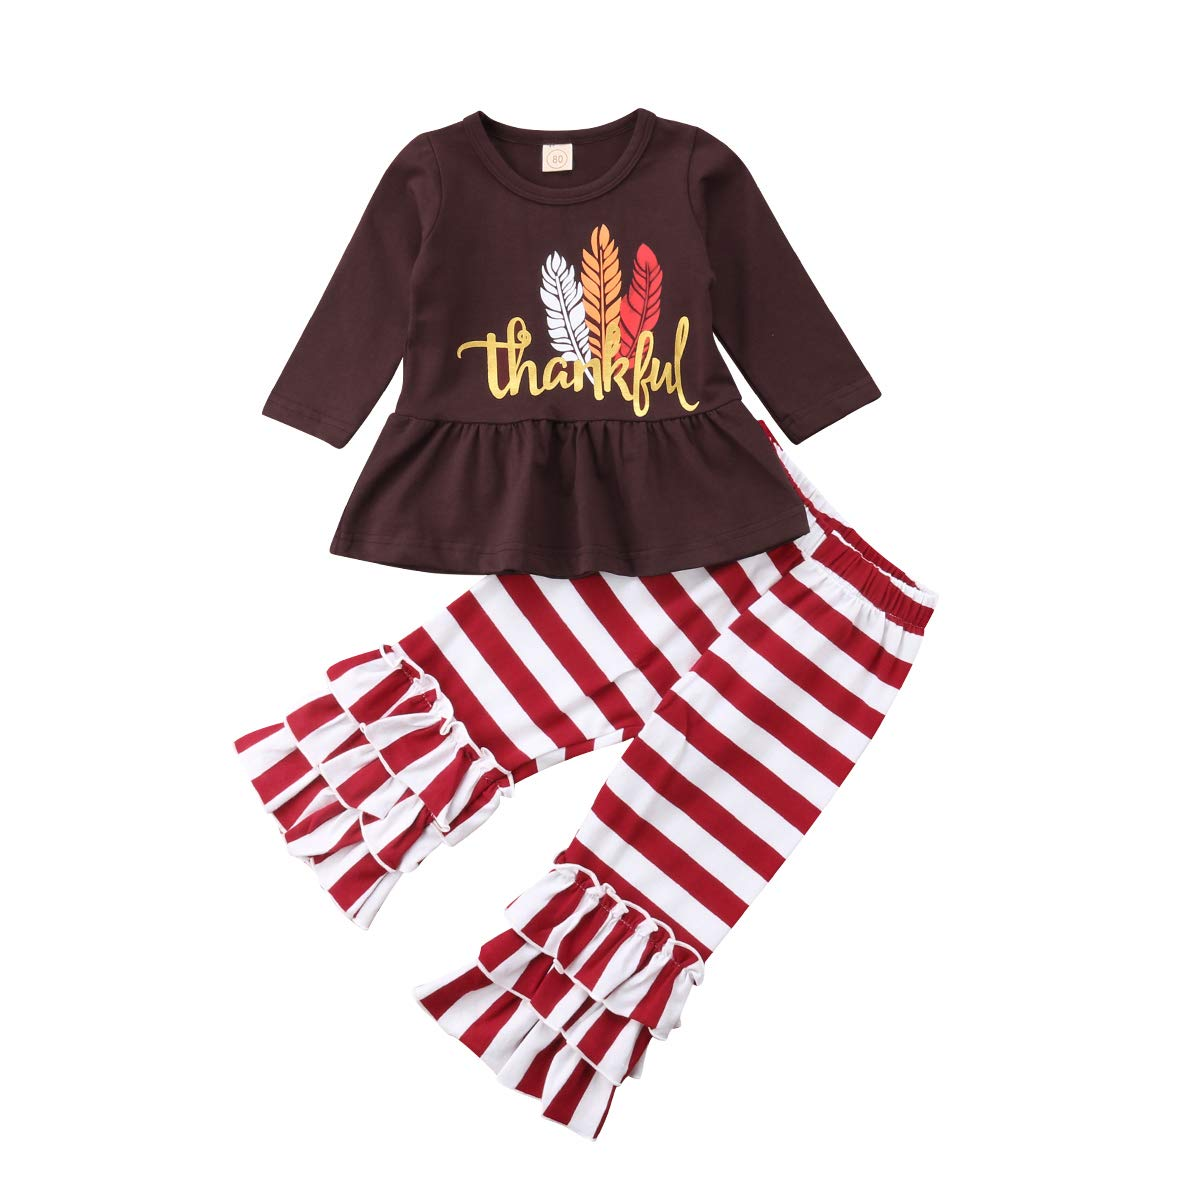 3Pcs Toddler Kids Baby Girls Clothes T-shirt Tops+Pants+Headband Outfits Set US